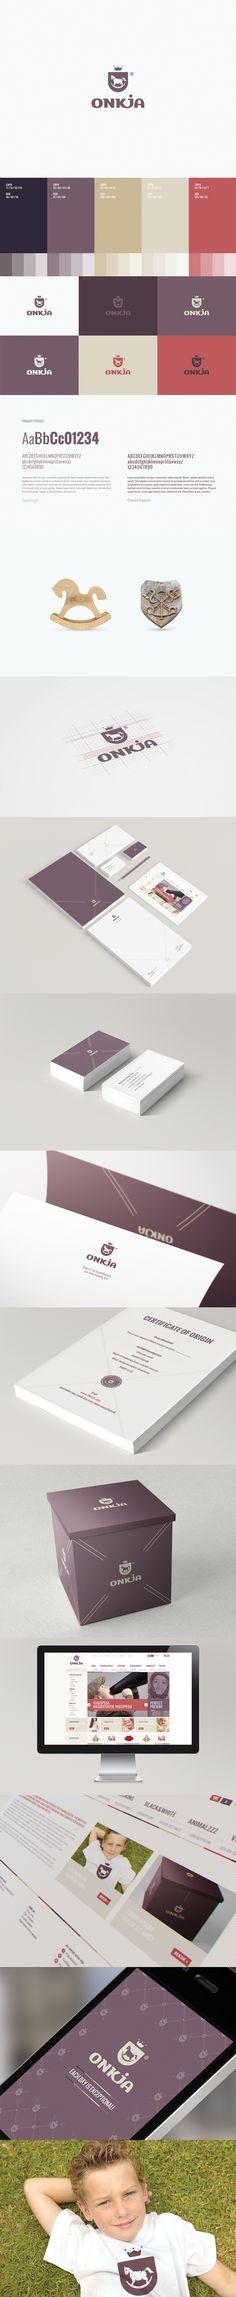 Onkja by Motyf , via Behance // #design #brand #love #colors #typo